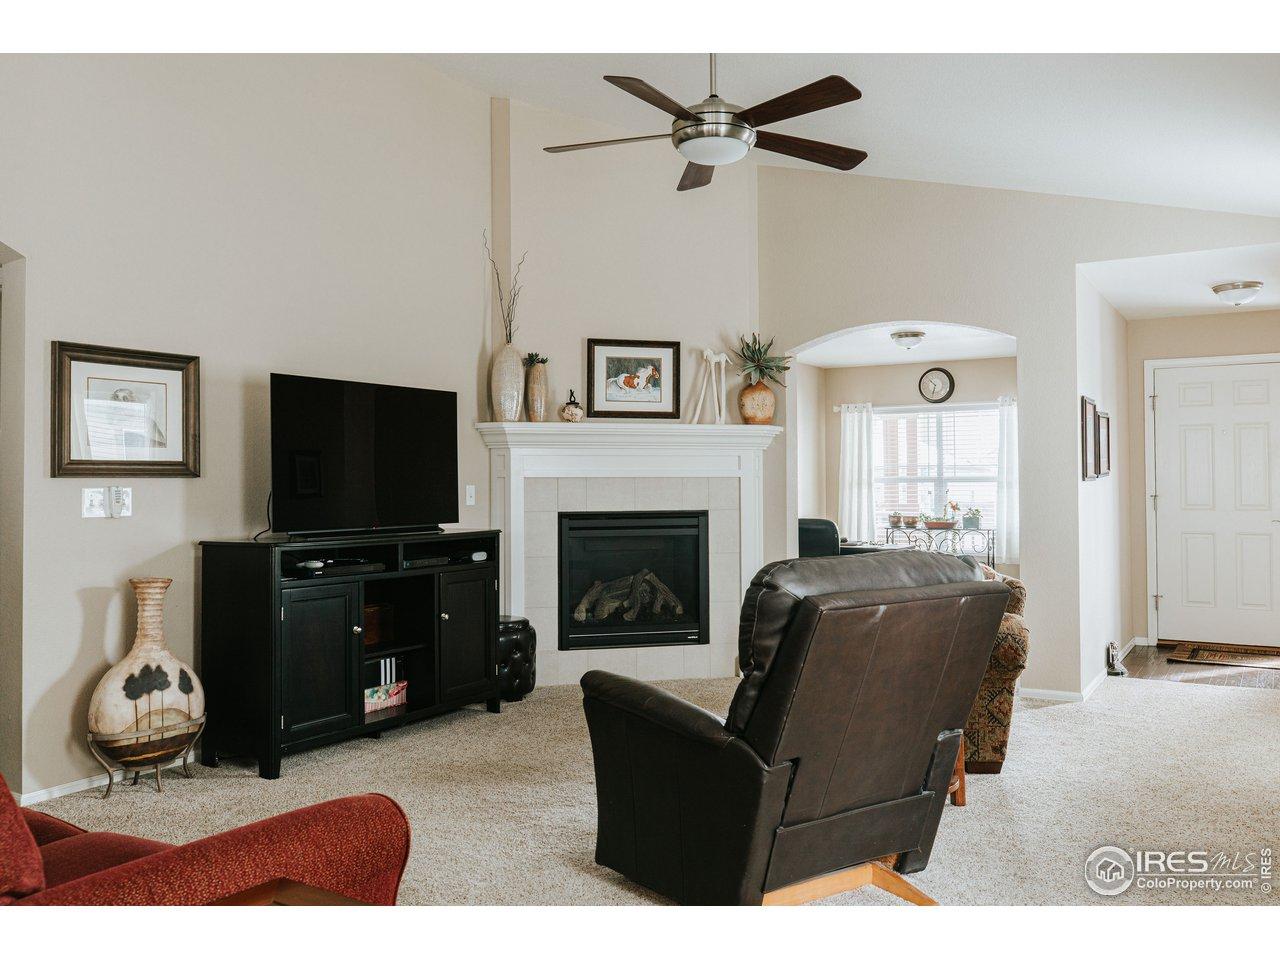 Gas fireplace & updated ceiling fan